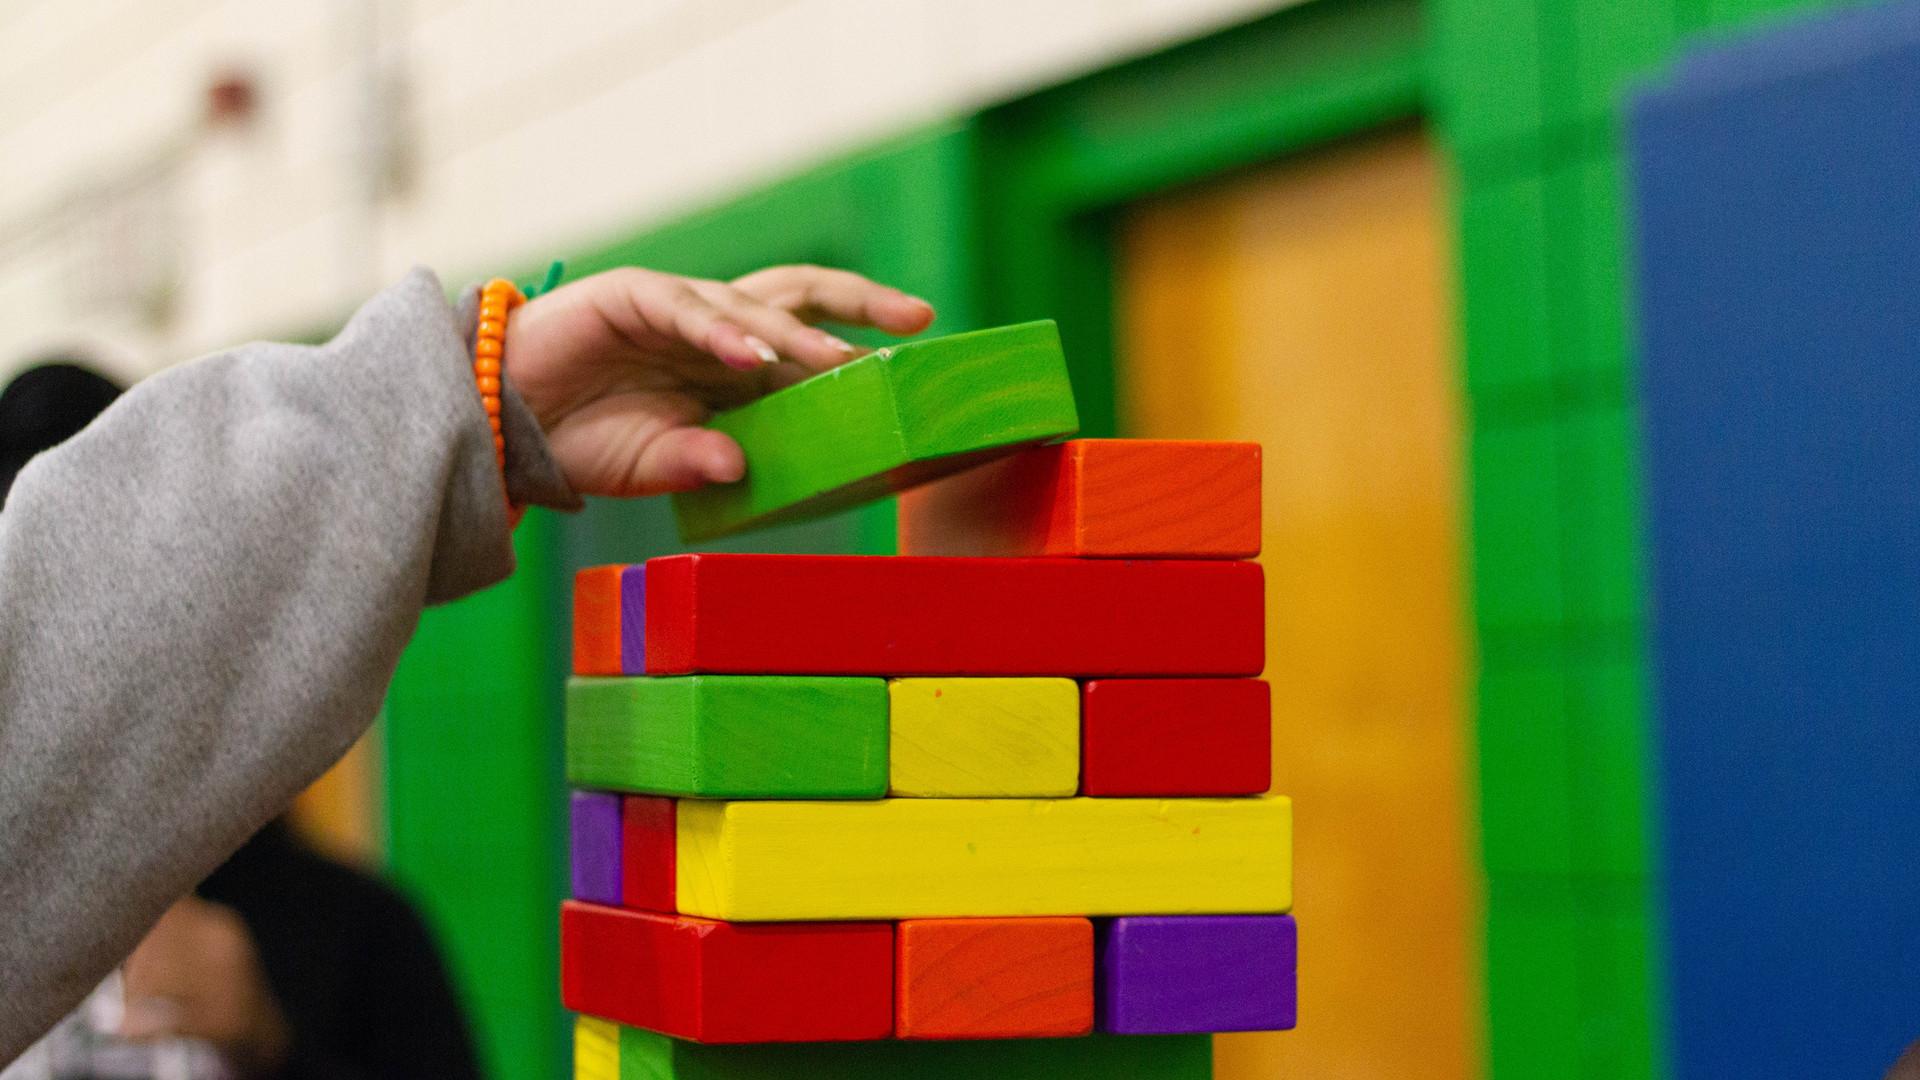 Kids Love Building Blocks!